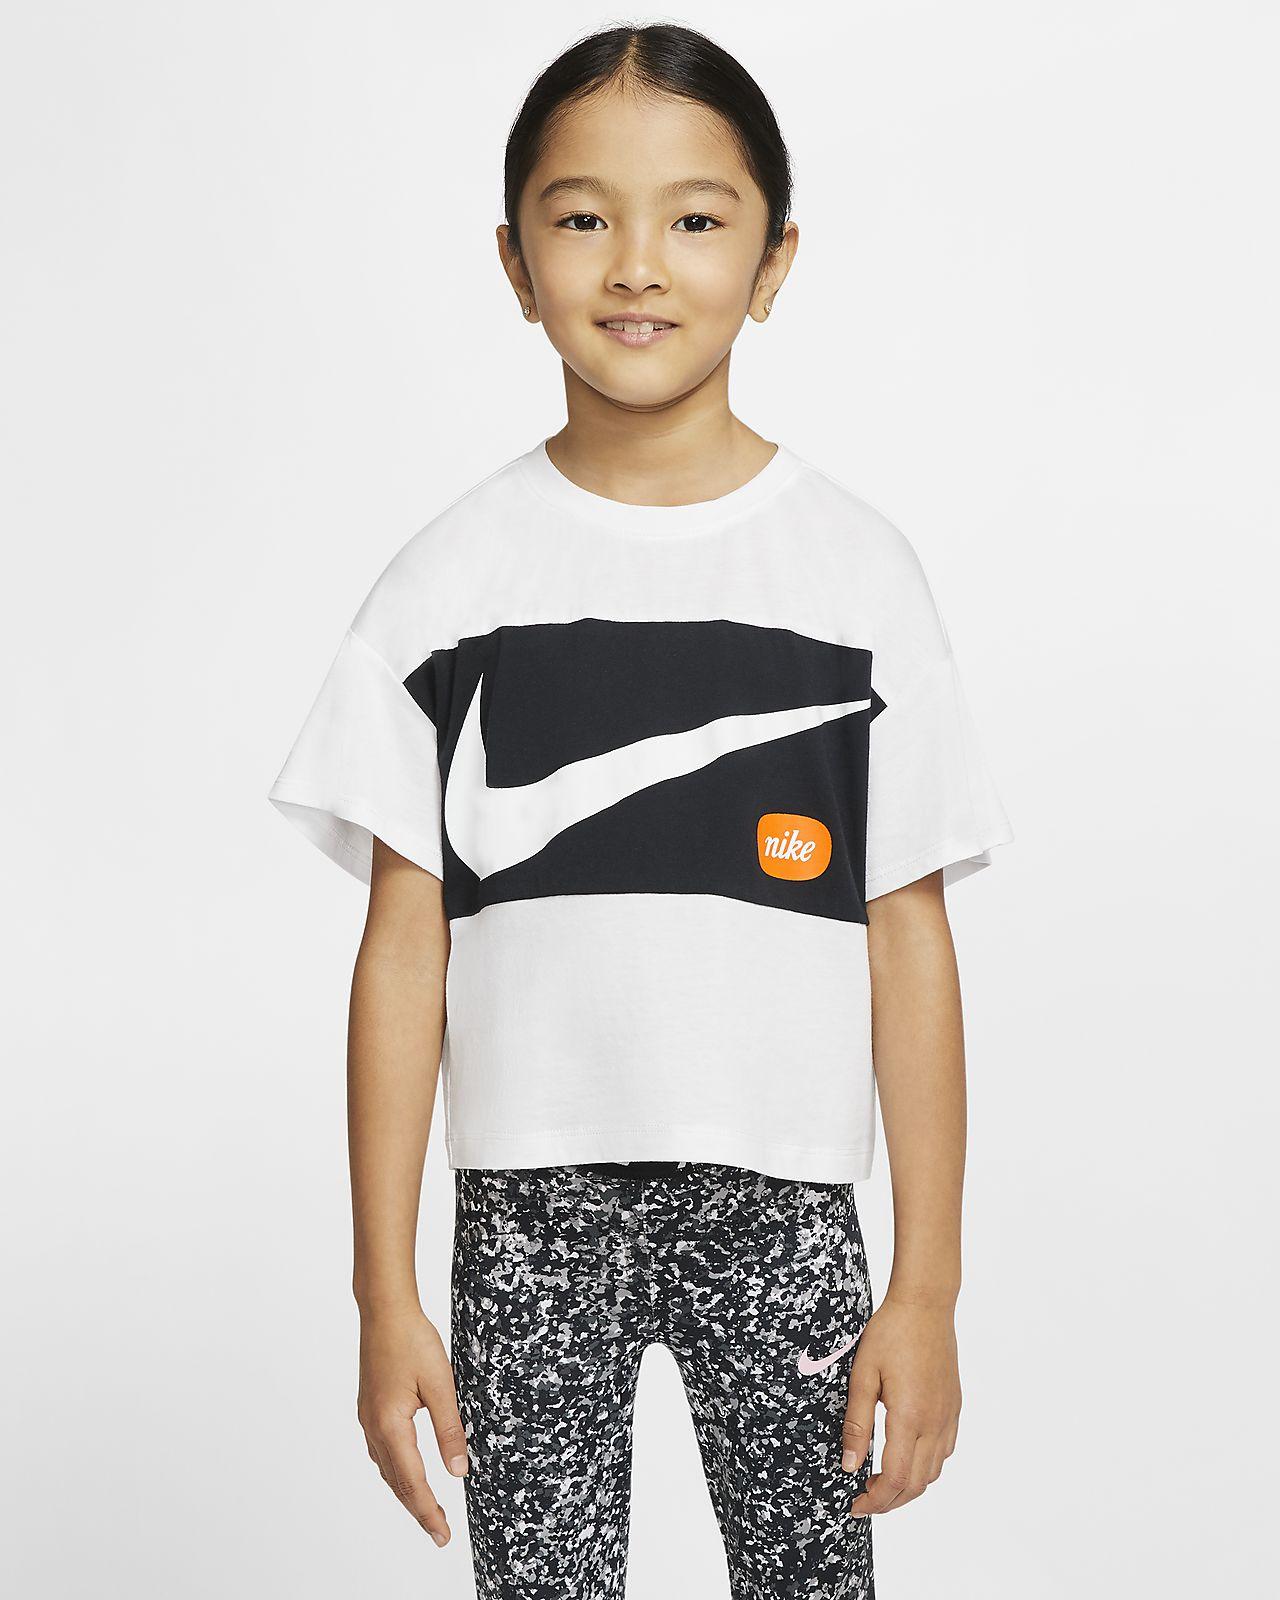 Nike Little Kids' Cropped Short-Sleeve Top